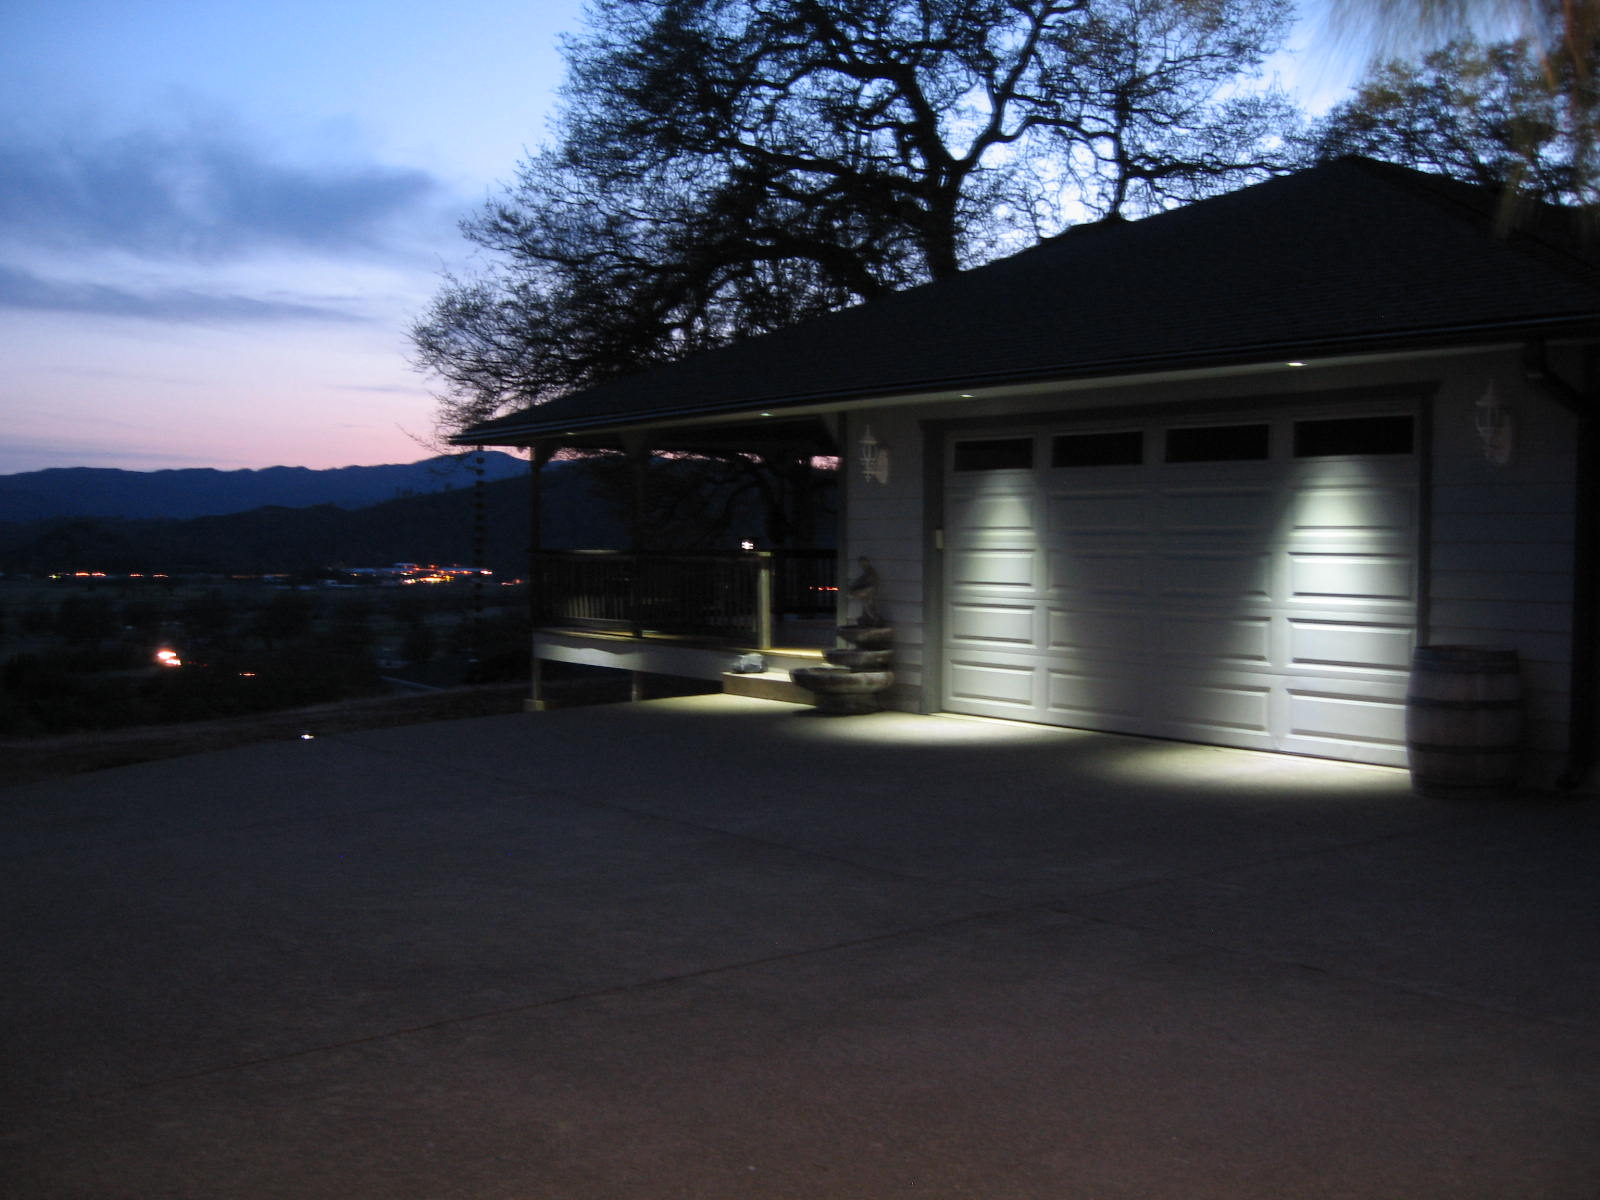 Par16 led bulb 3w spot par ar111 led solution for How to install driveway lights